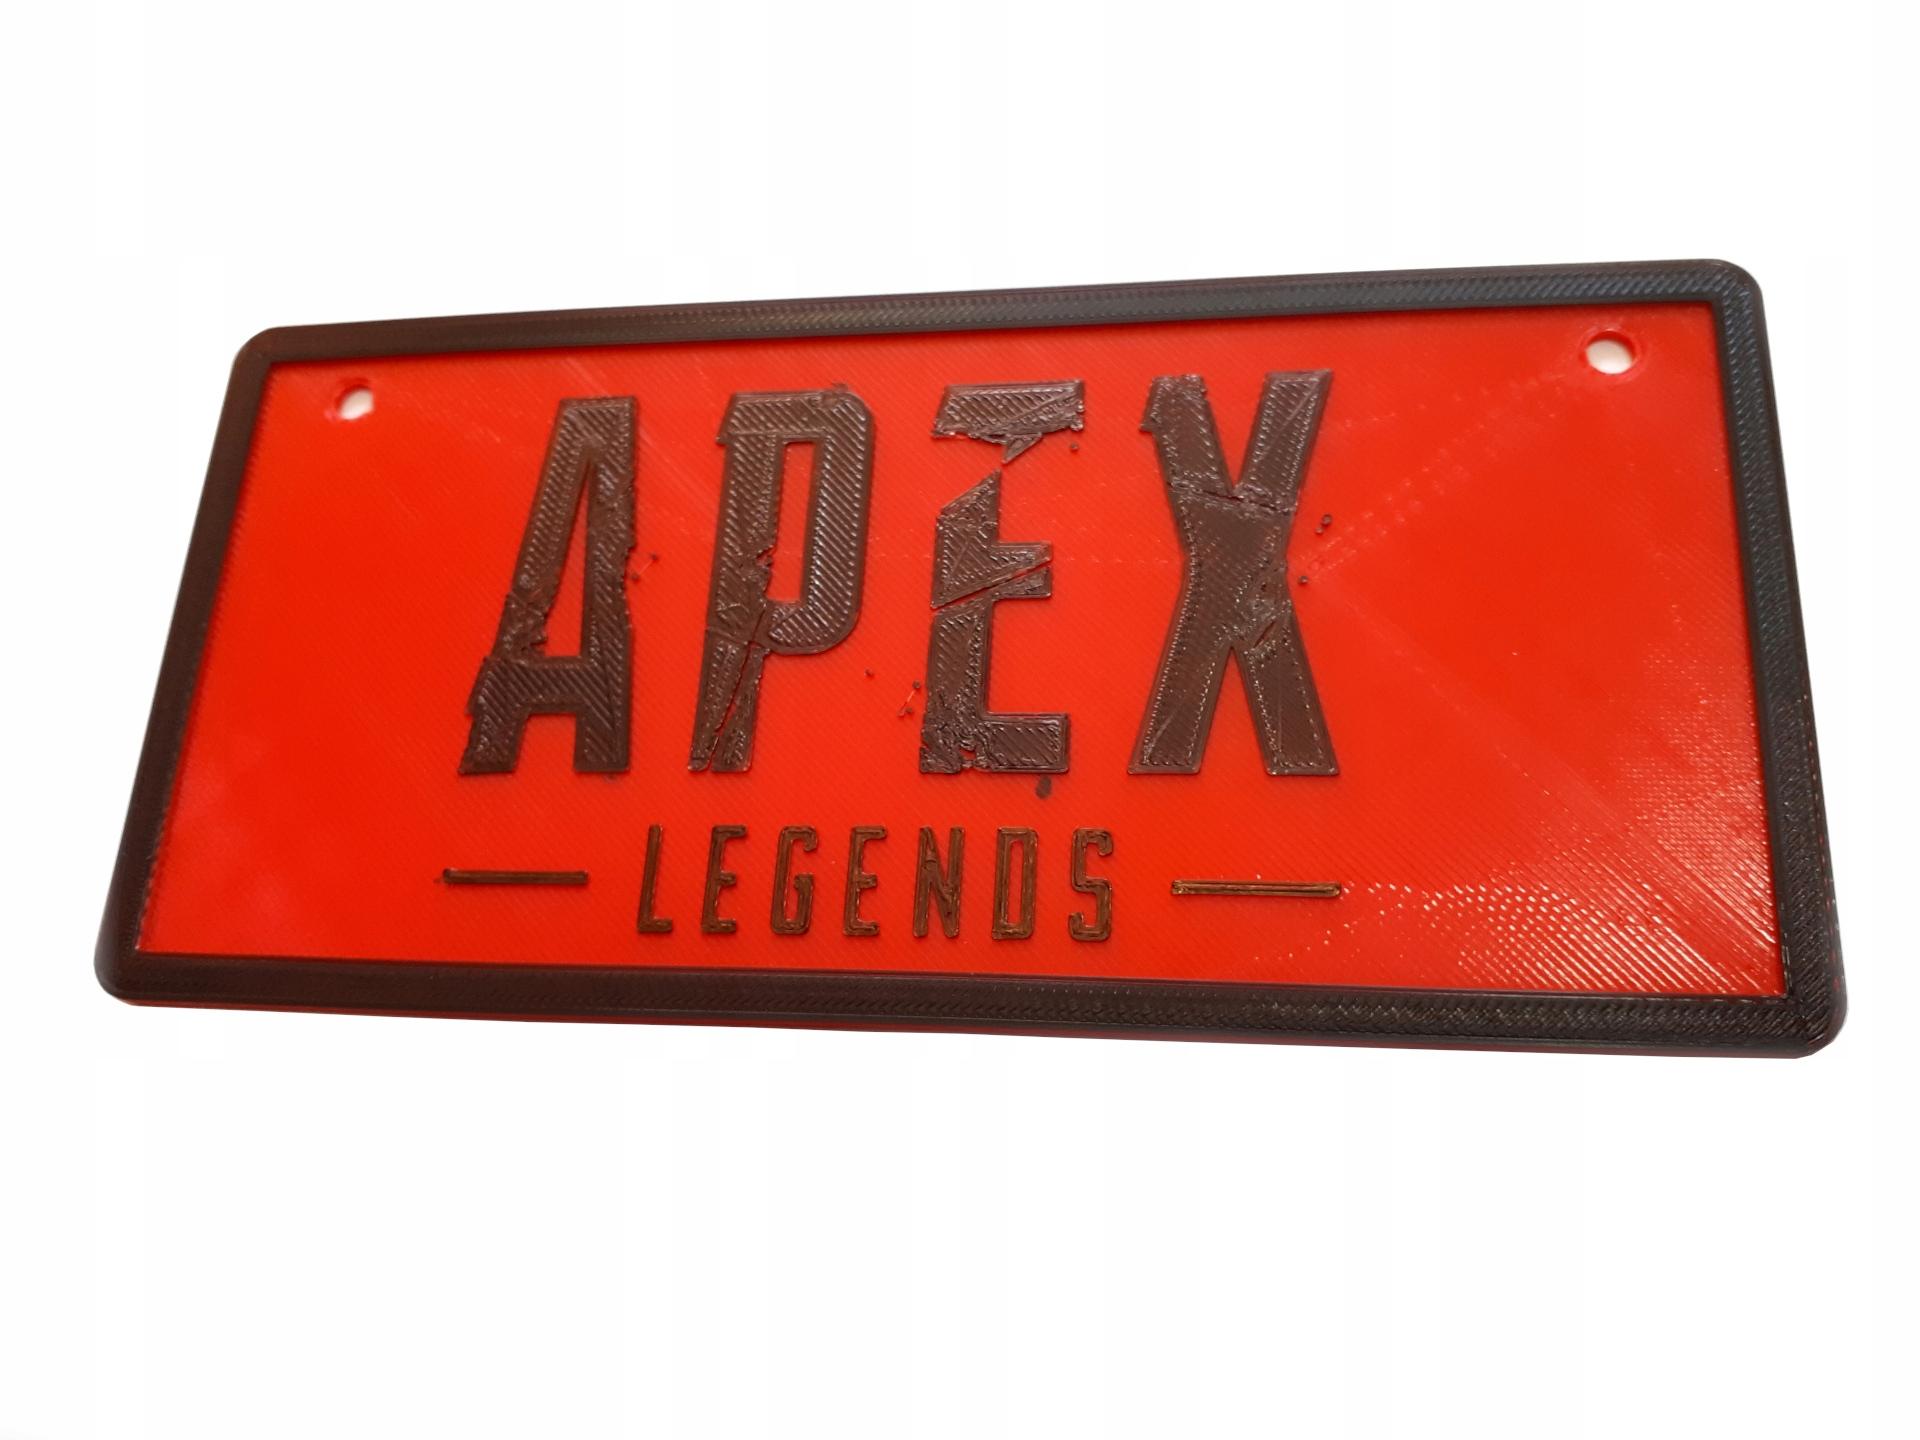 Item Tabliczka na drzwi Apex Legends nad biurko pokój